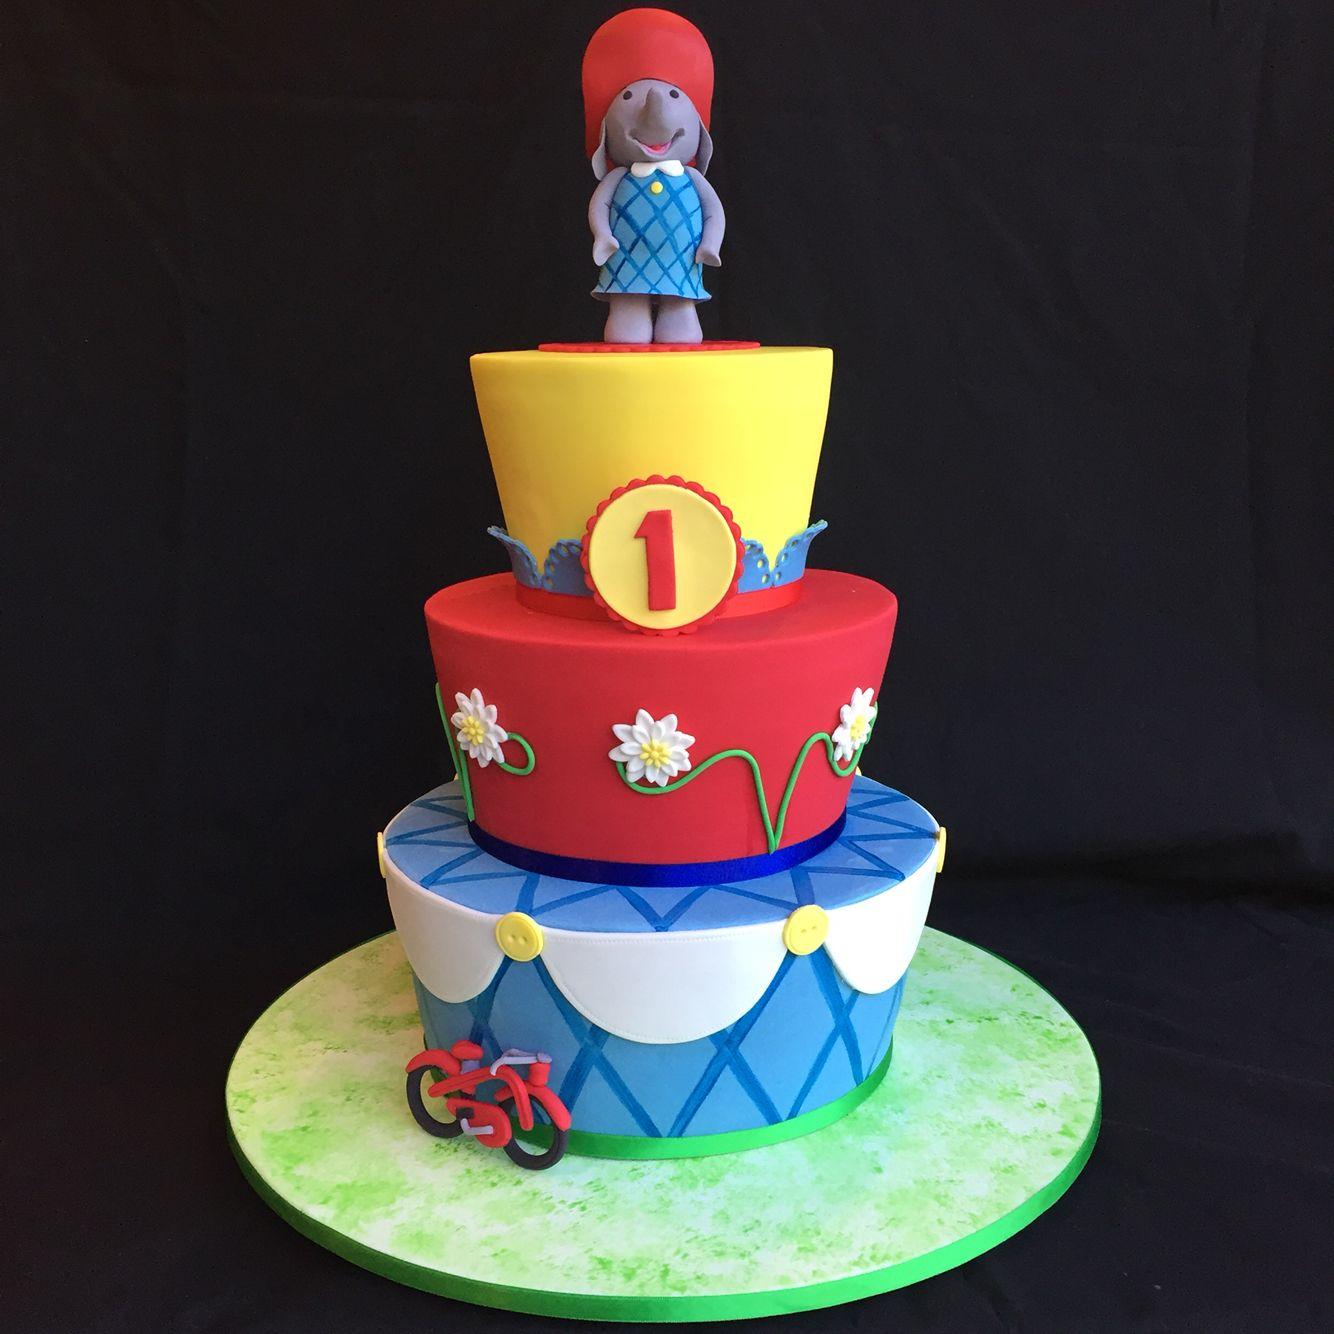 Ella the Elephant themed cake allsortscakessydney Cakes Ive